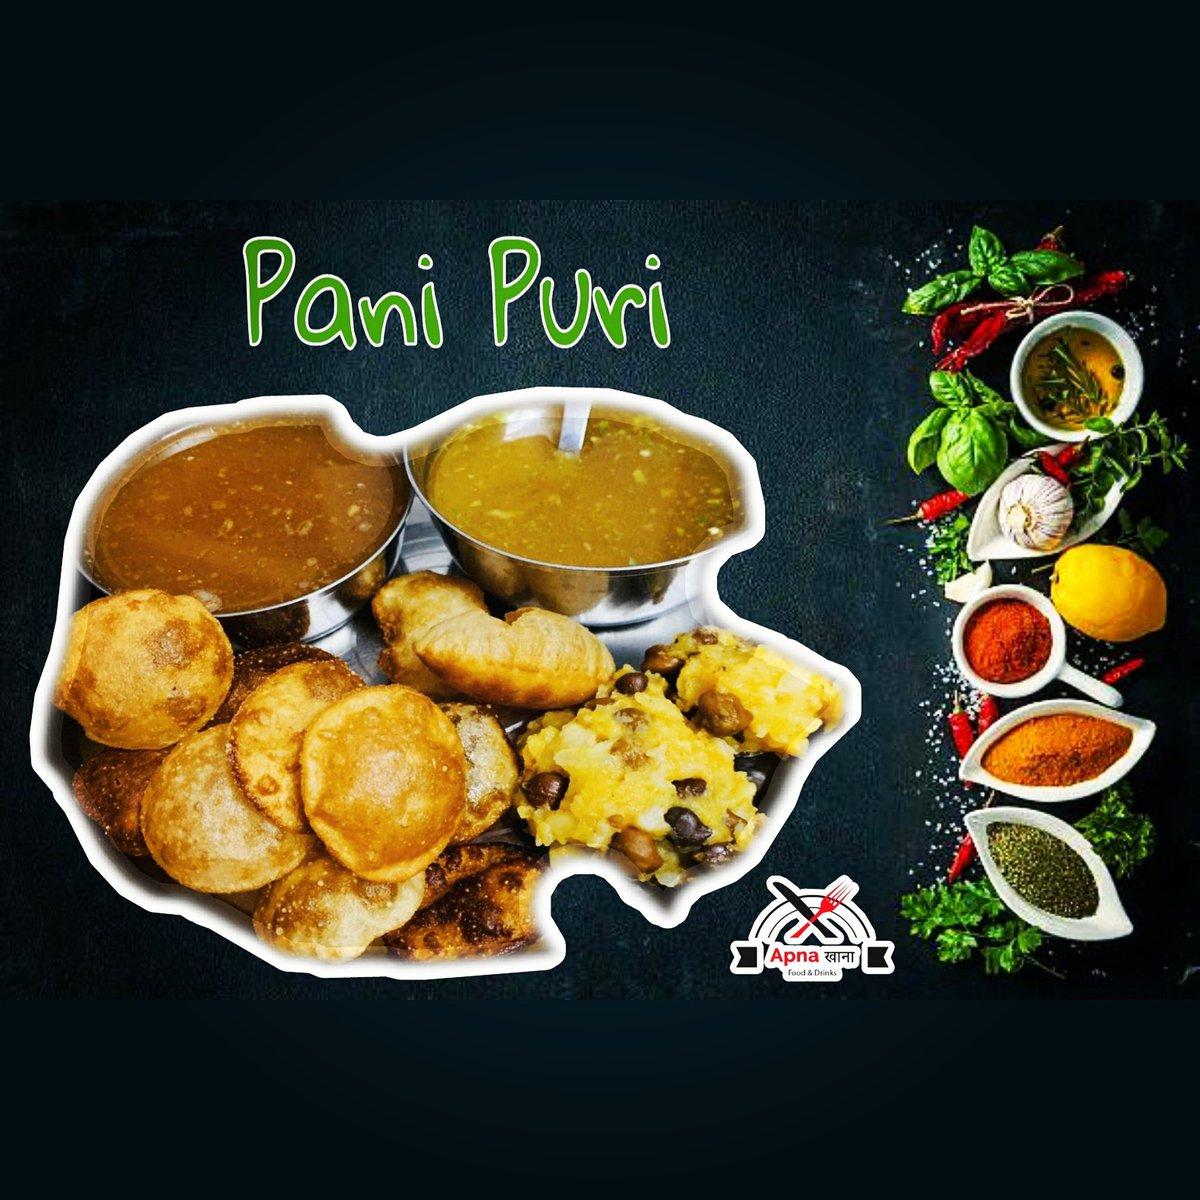 #panipuri #apnakhana #homemade #StayHomeStaySafe #lockdown #Coronaindia #panipurilovers #foodie #golgappa #food #chaat #golgappe #foodphotography #indianfood #foodporn #foodblogger #indianstreetfood #dahipuri #foodstagram #foodies #foodgasm #desifoodie #india #mumbaistreetfood